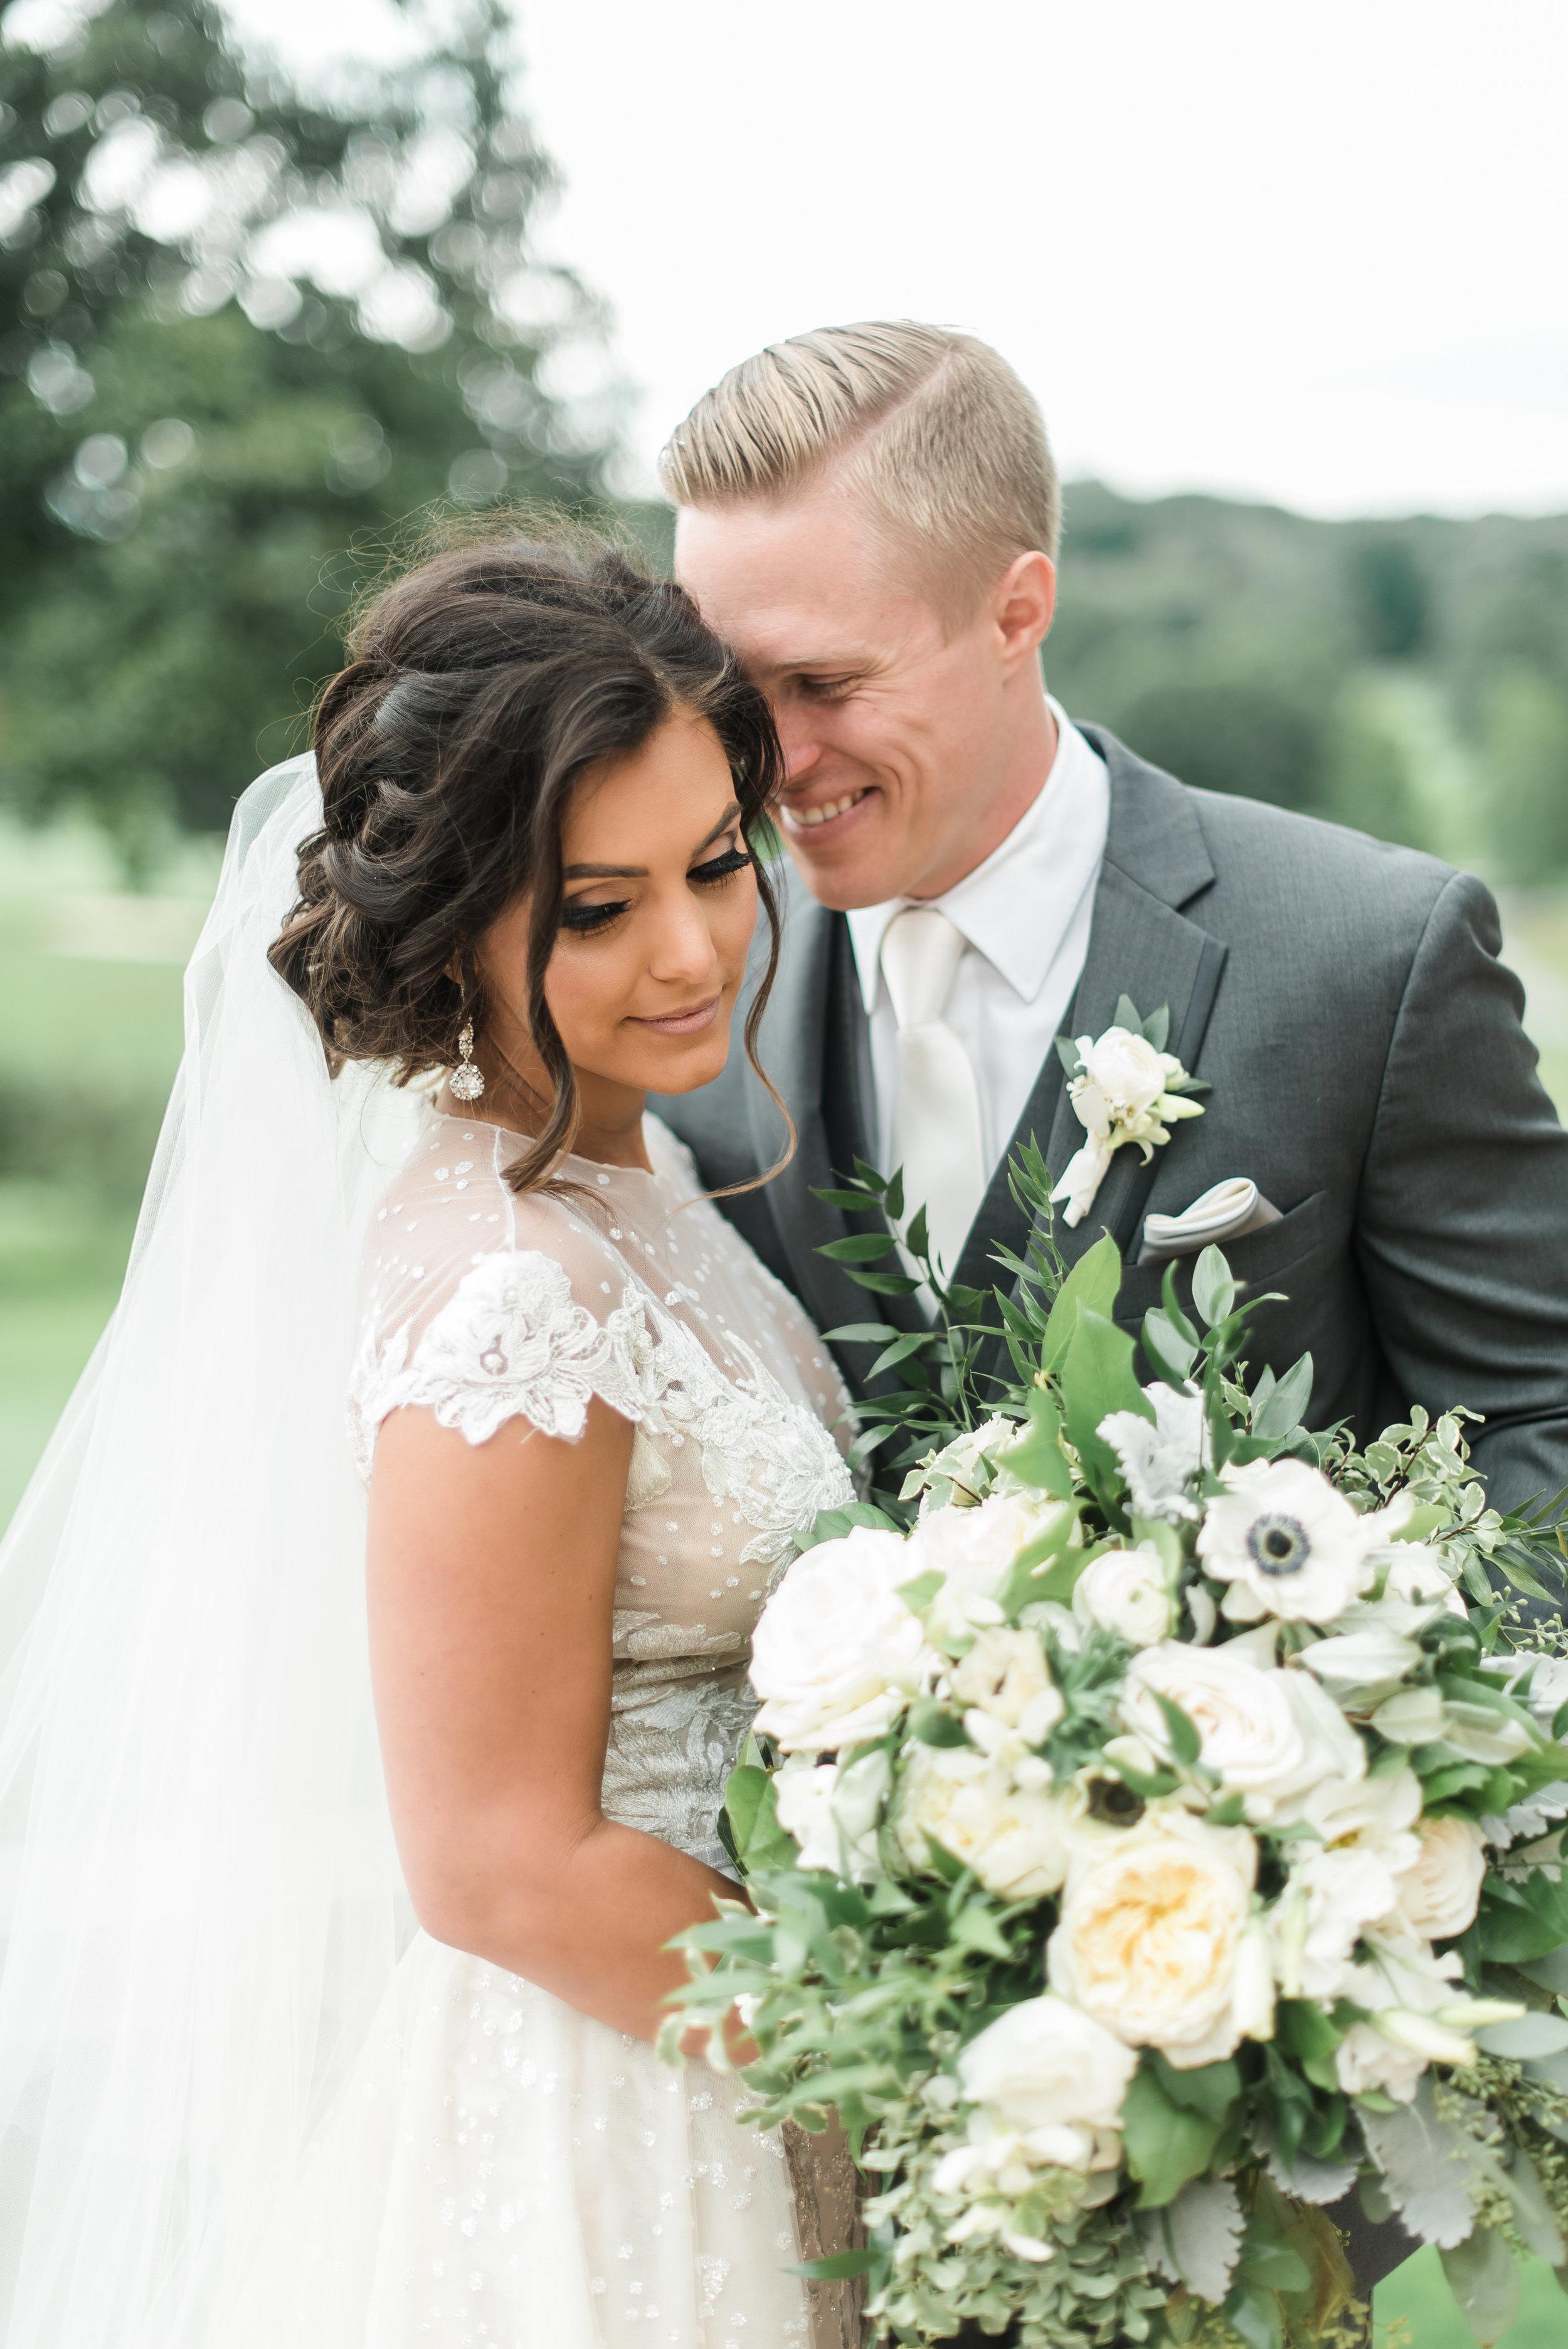 pittsburgh-wedding-photographer-classic-greenery-foxchapelgolfclub0025.jpg